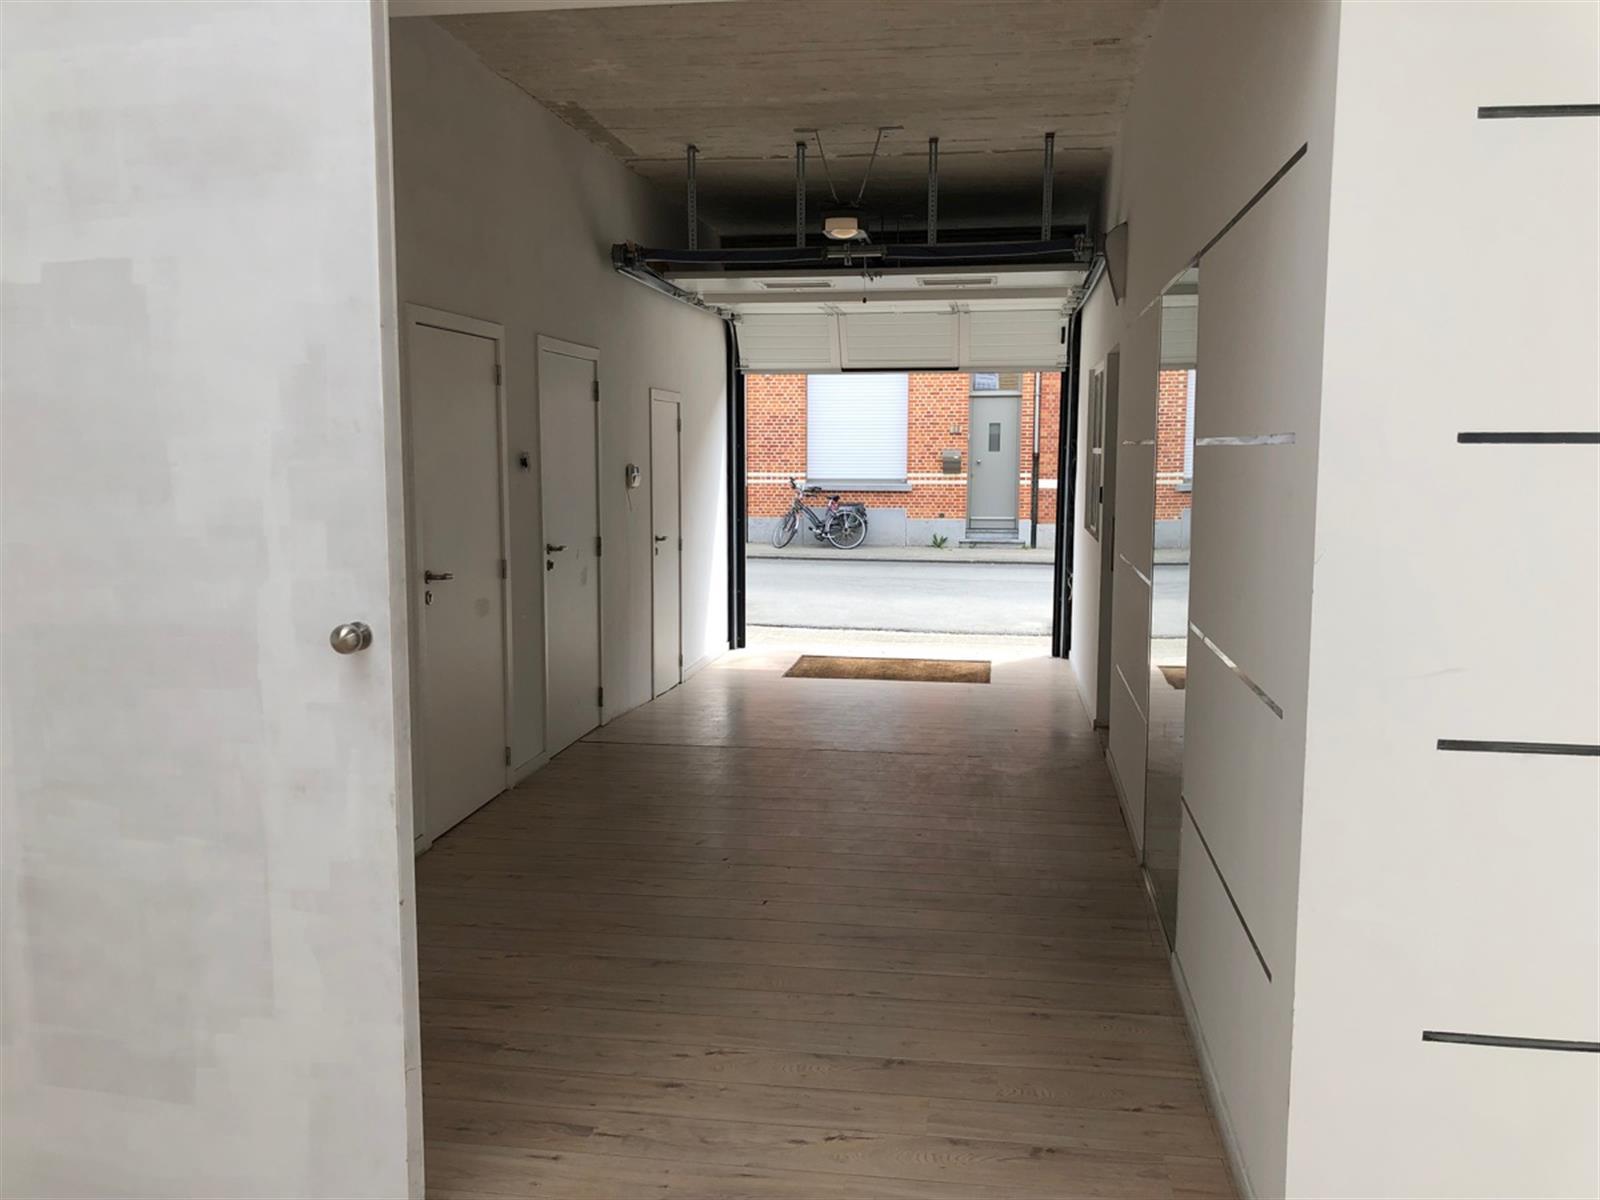 Kantoor- of opslagruimte